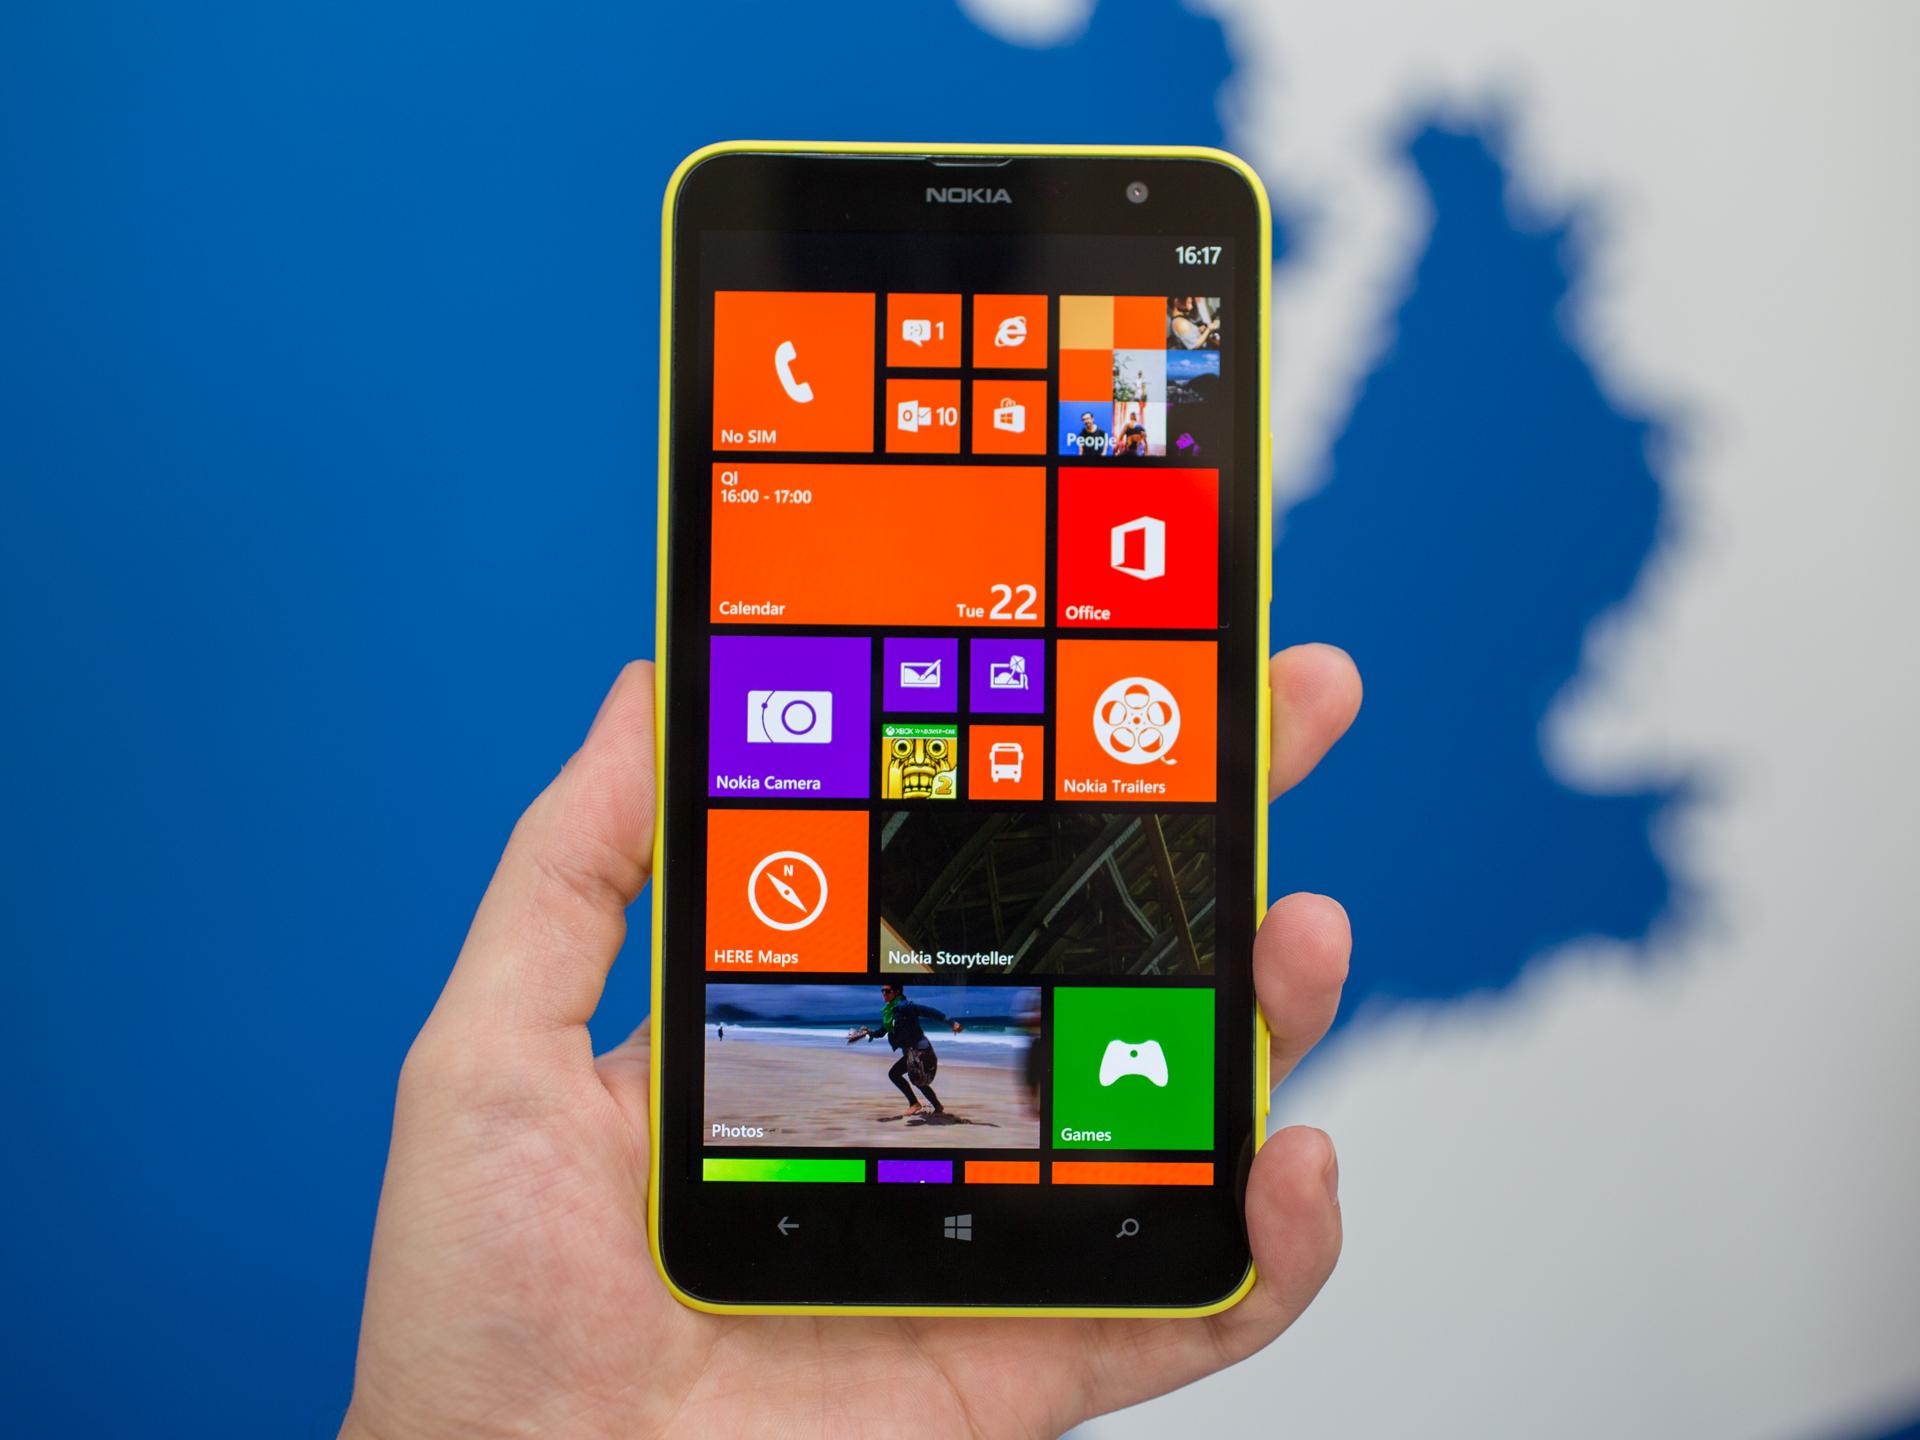 Nokia 1520 Tops The List Of Best 5